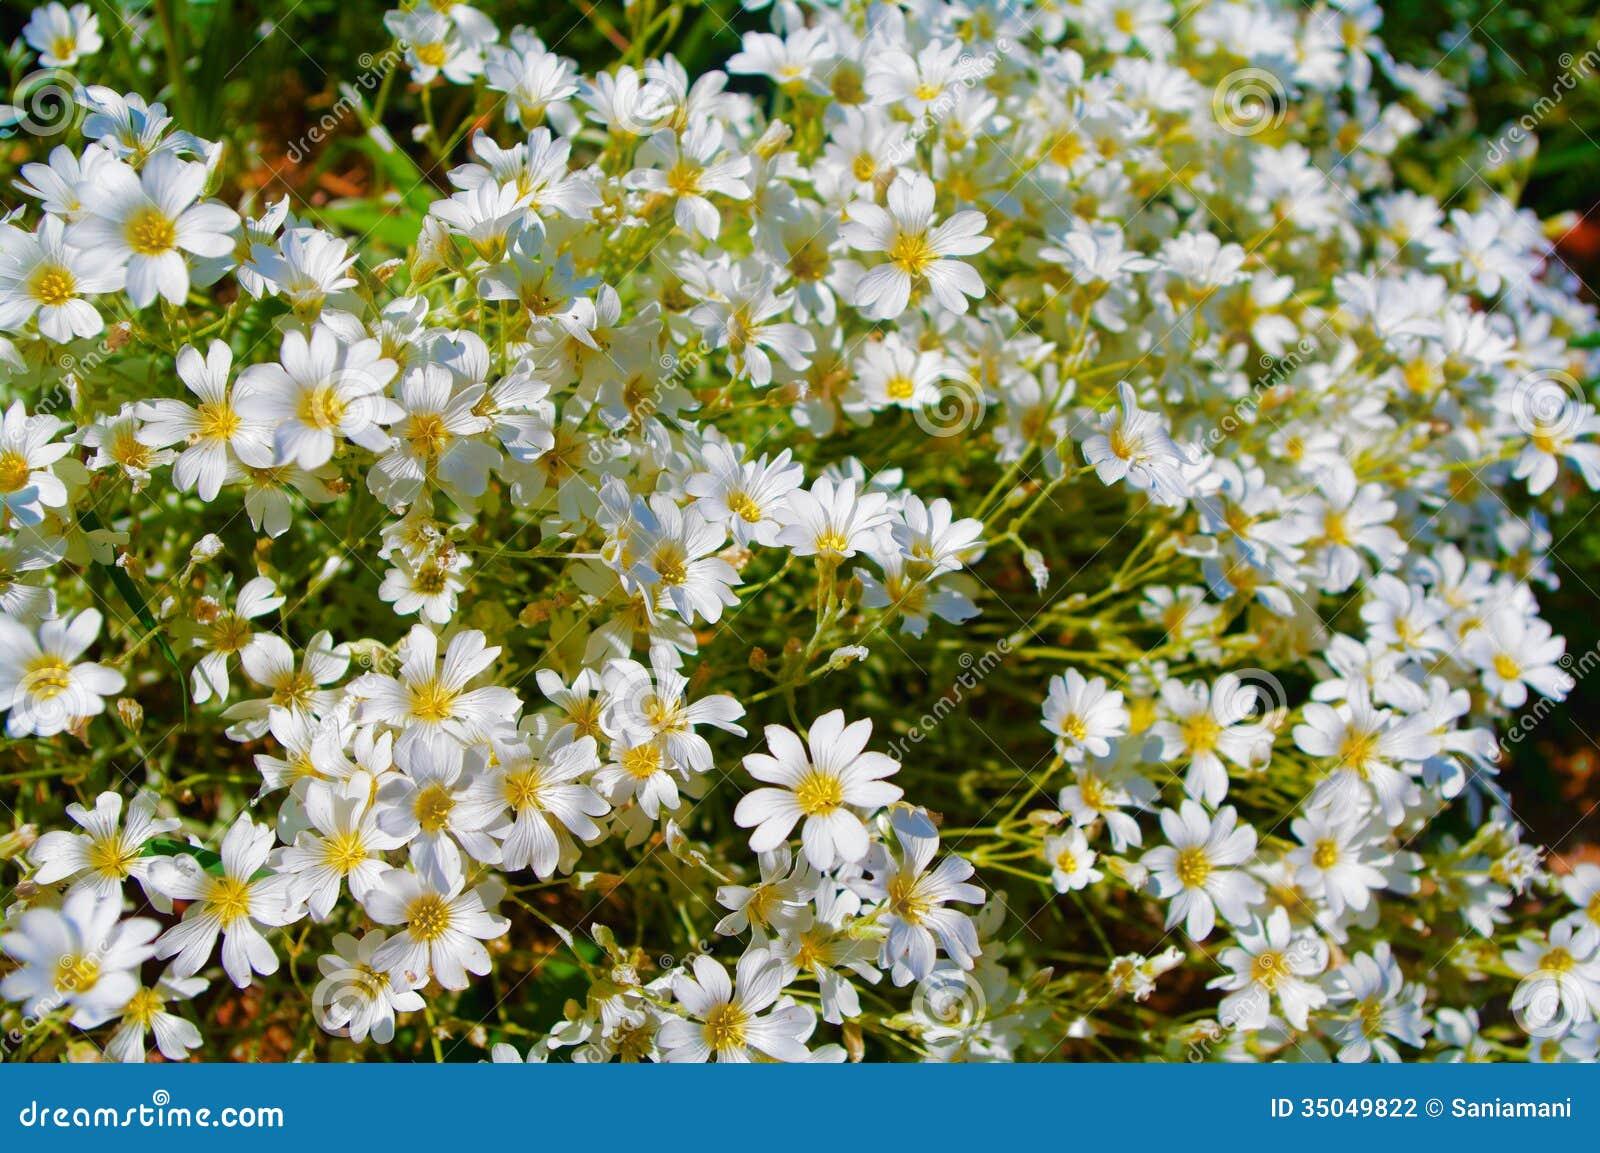 petites fleurs blanches photographie stock image 35049822. Black Bedroom Furniture Sets. Home Design Ideas